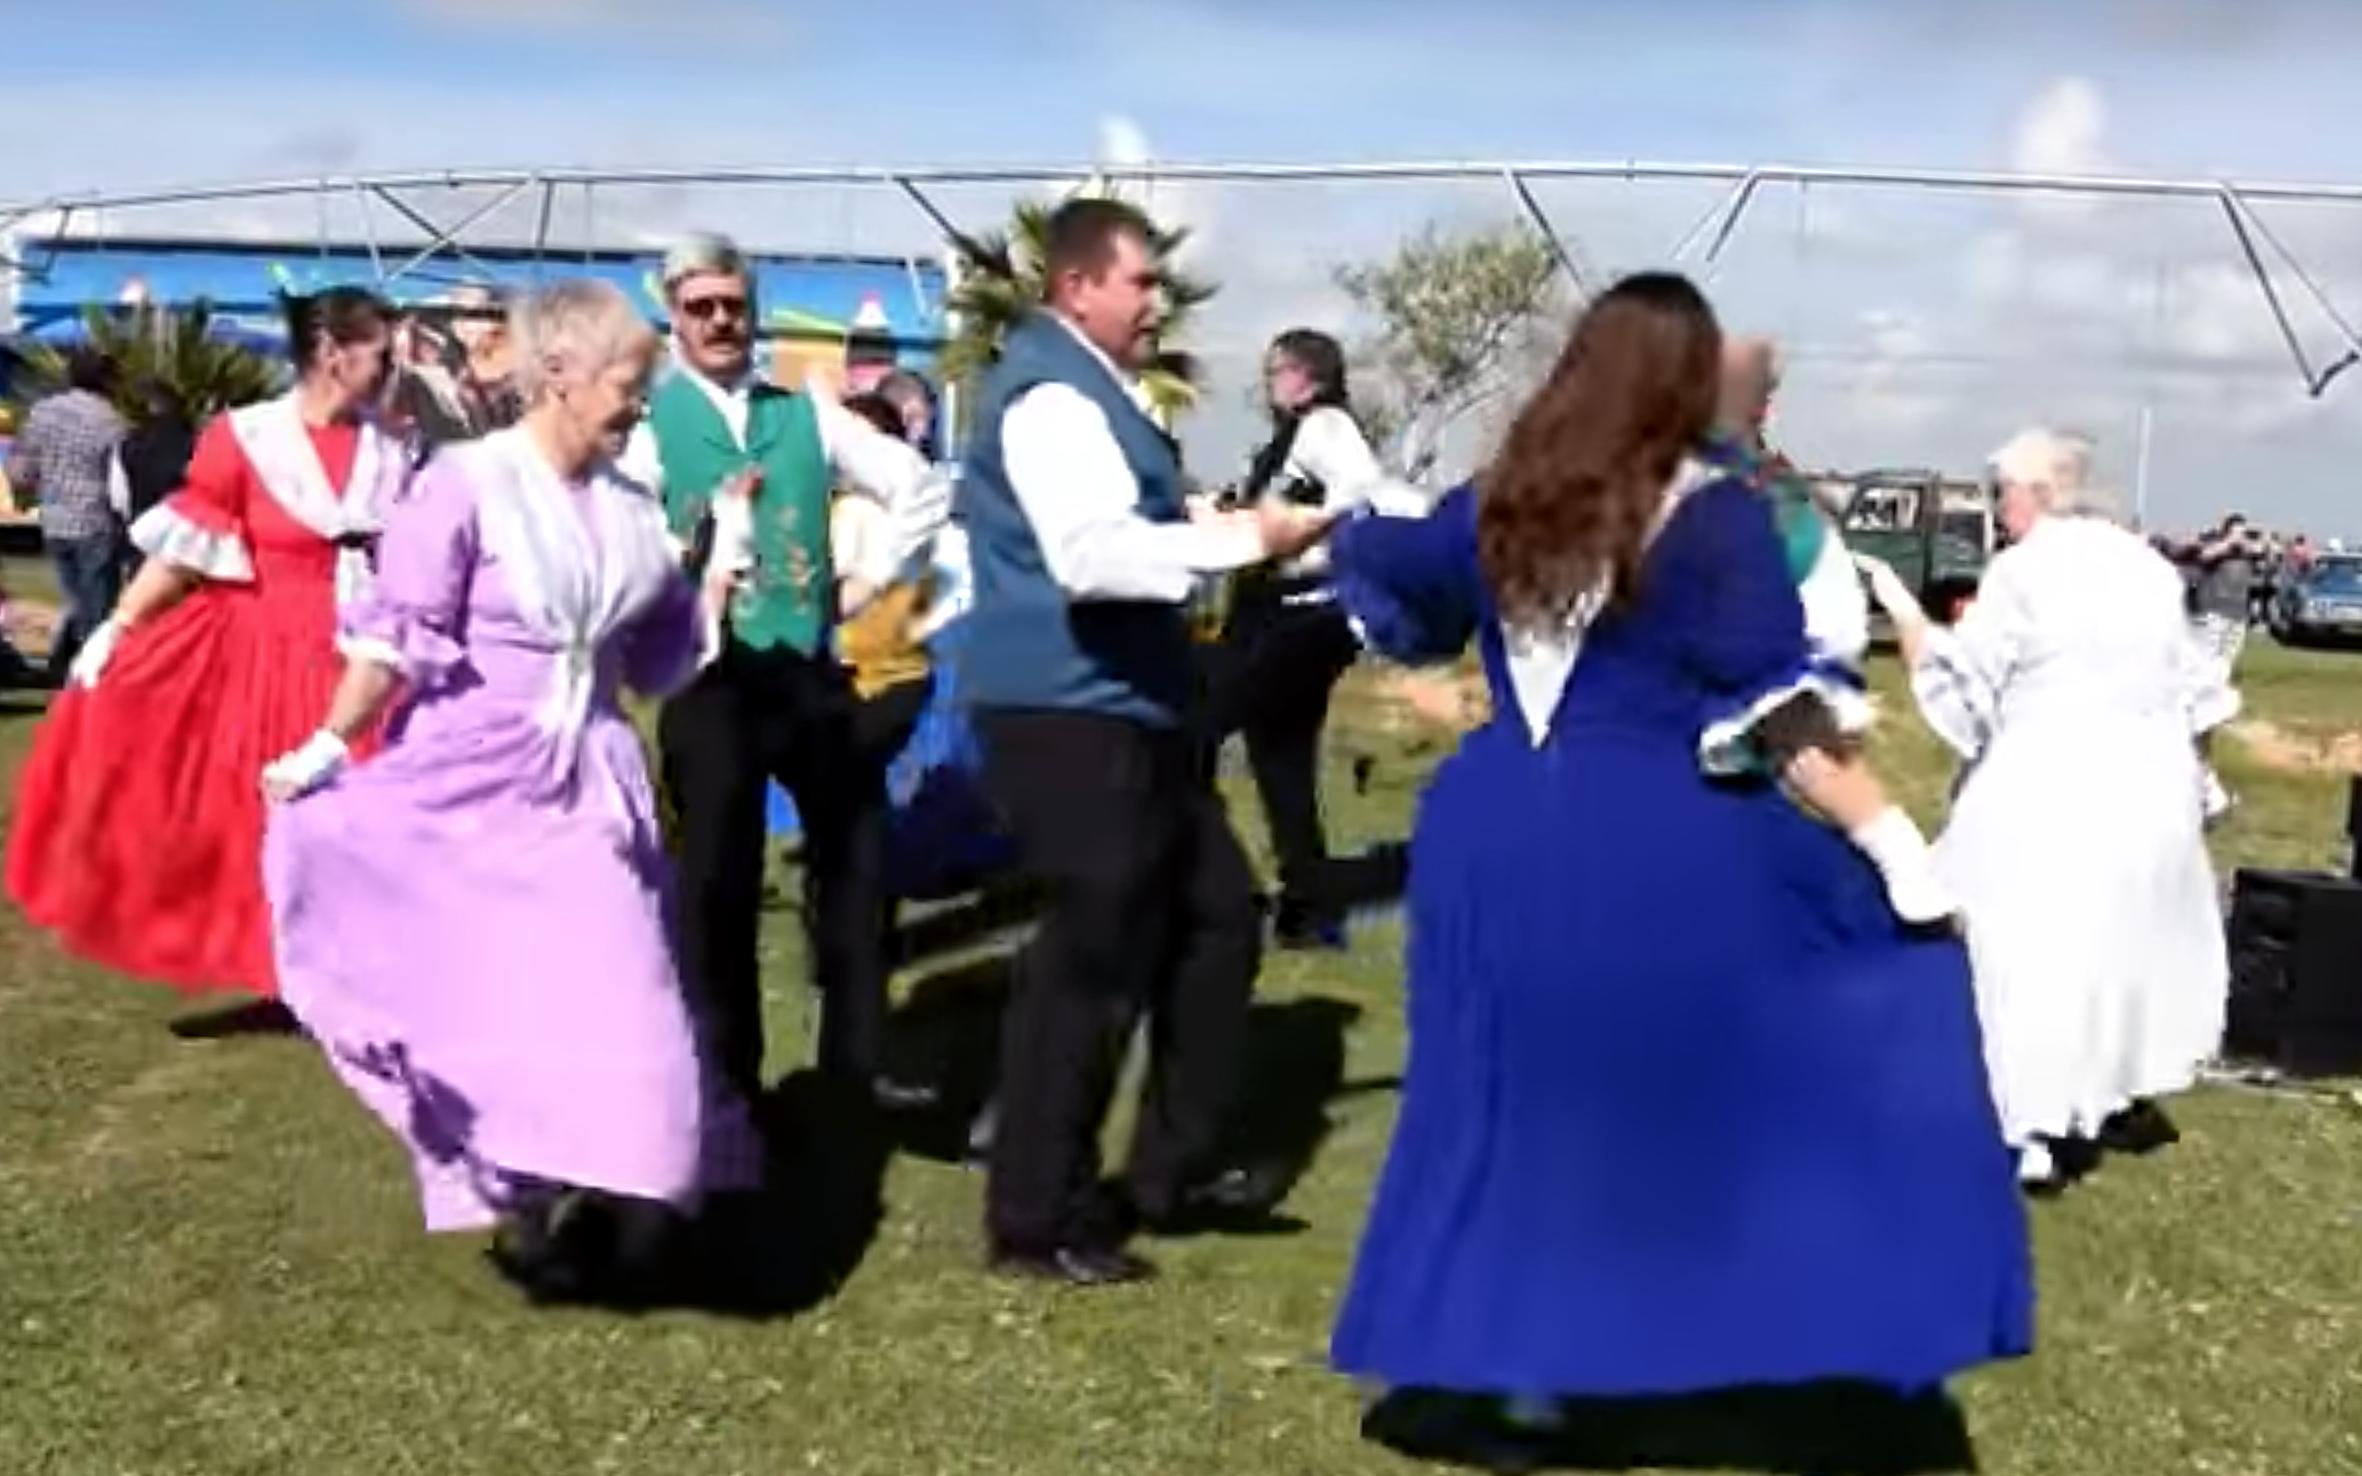 946.Volkspele / South Africa - Volkspele is a South African folk dance tradition. Volkspele means